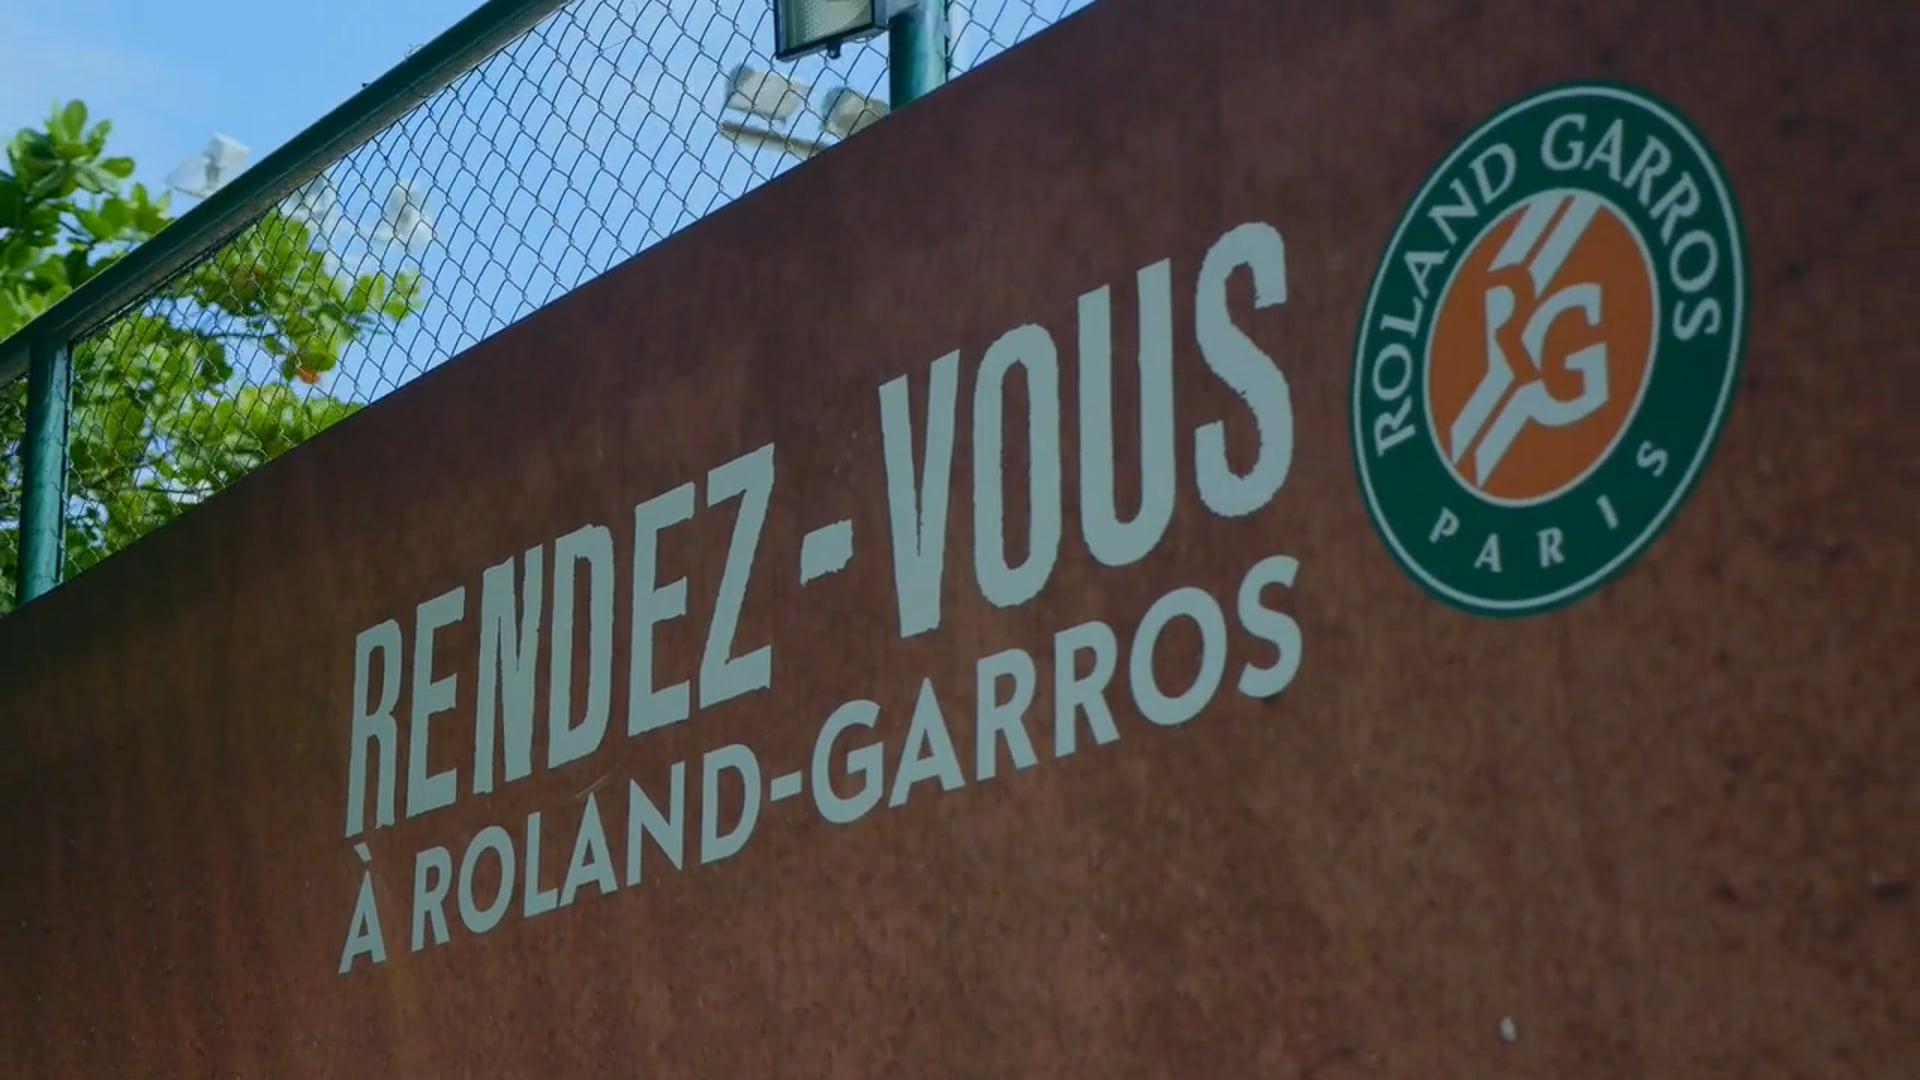 RENDEZ - VOUZ | ROLAND GARROS 2018